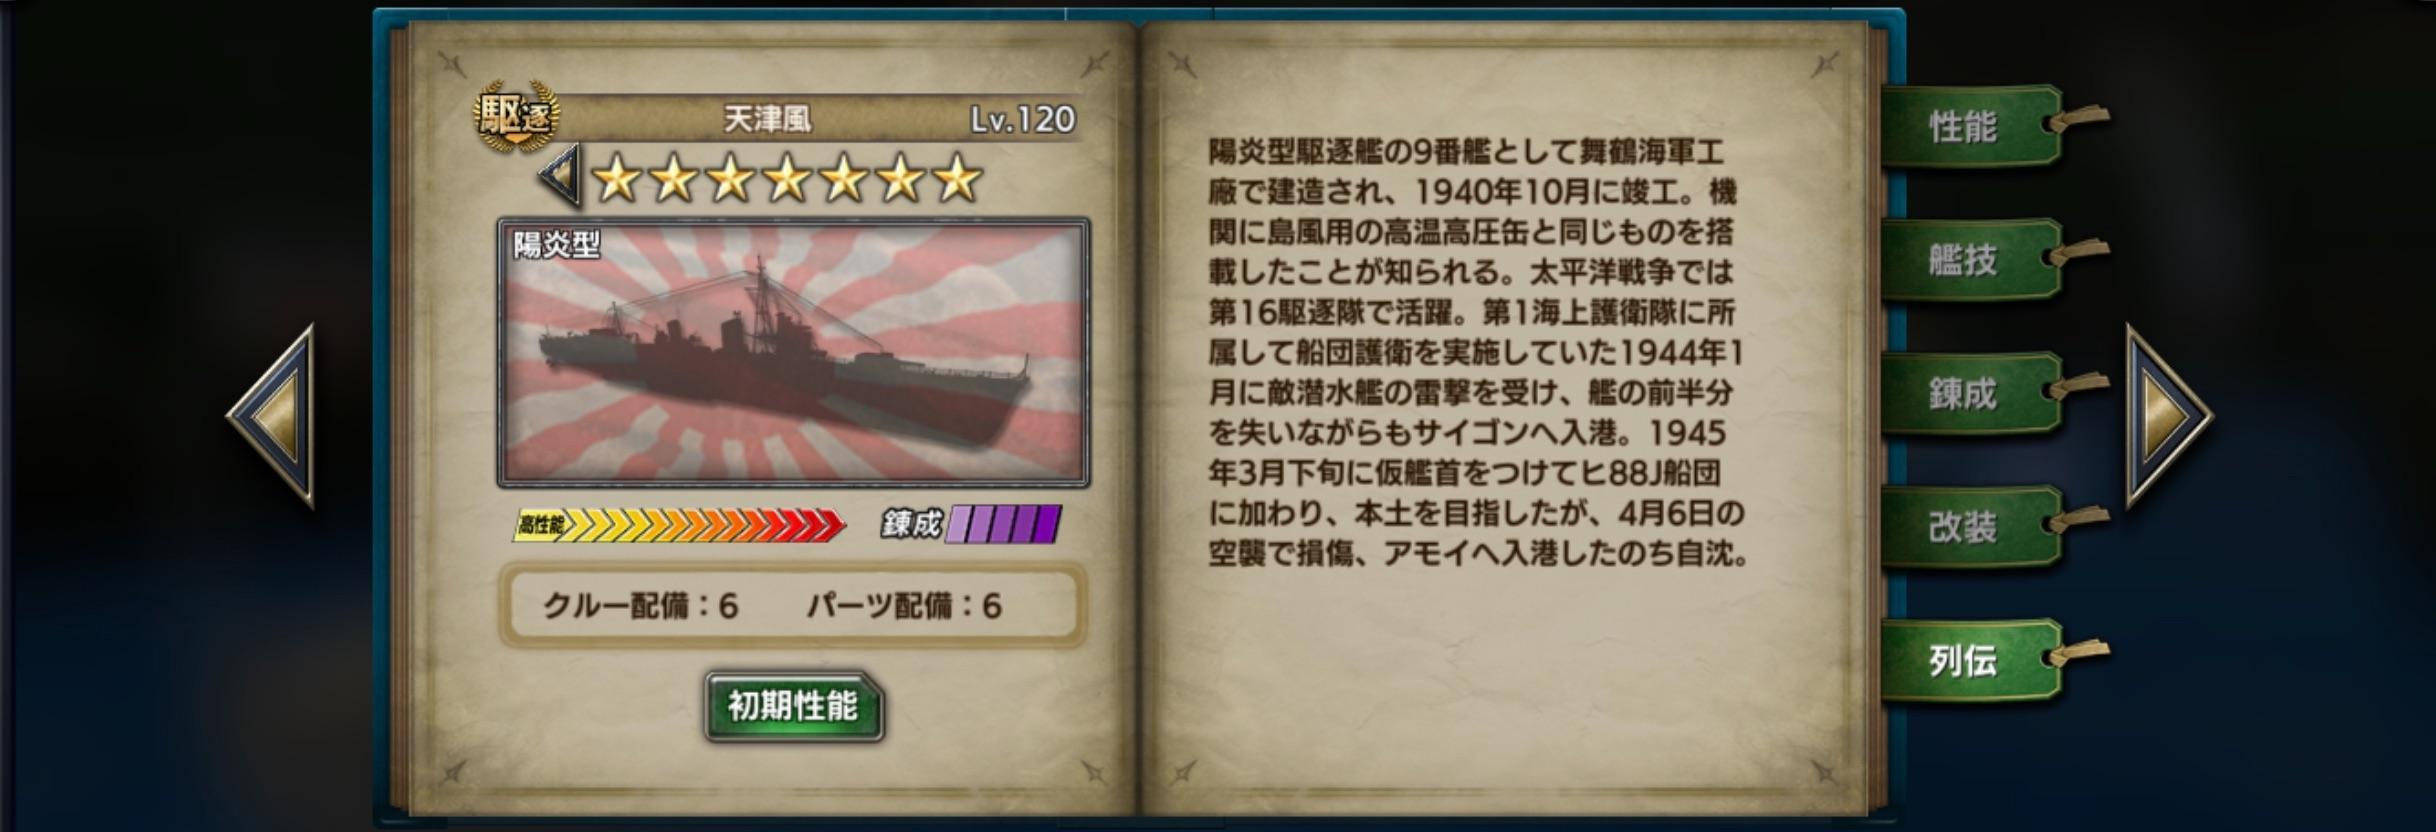 amatsukaze-history